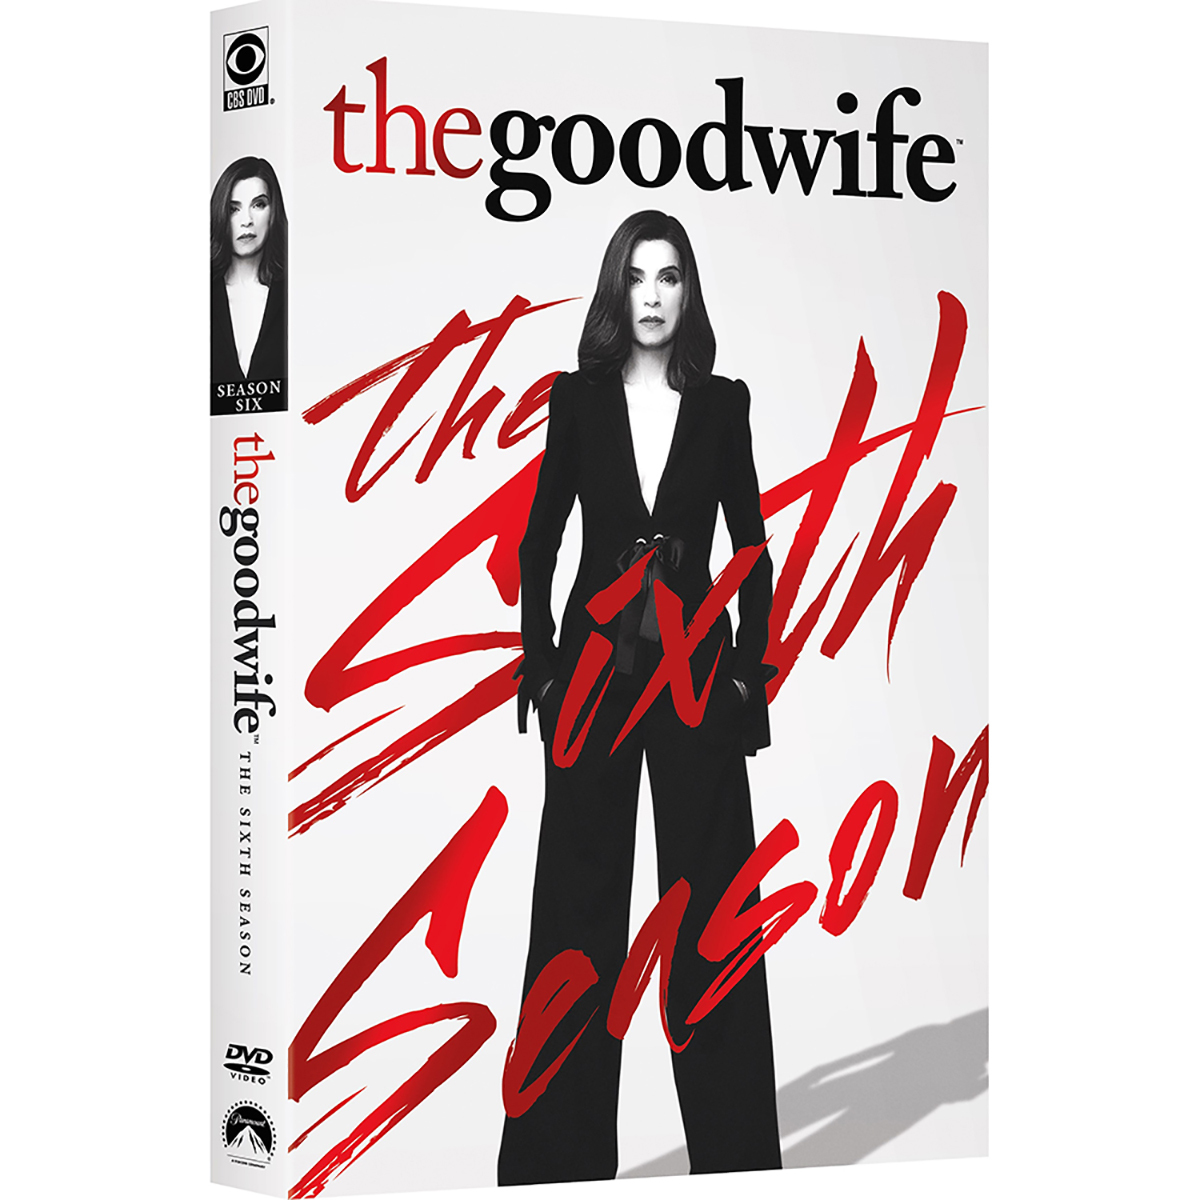 The Good Wife: Season 6 DVD -  DVDs & Videos 6445-858451